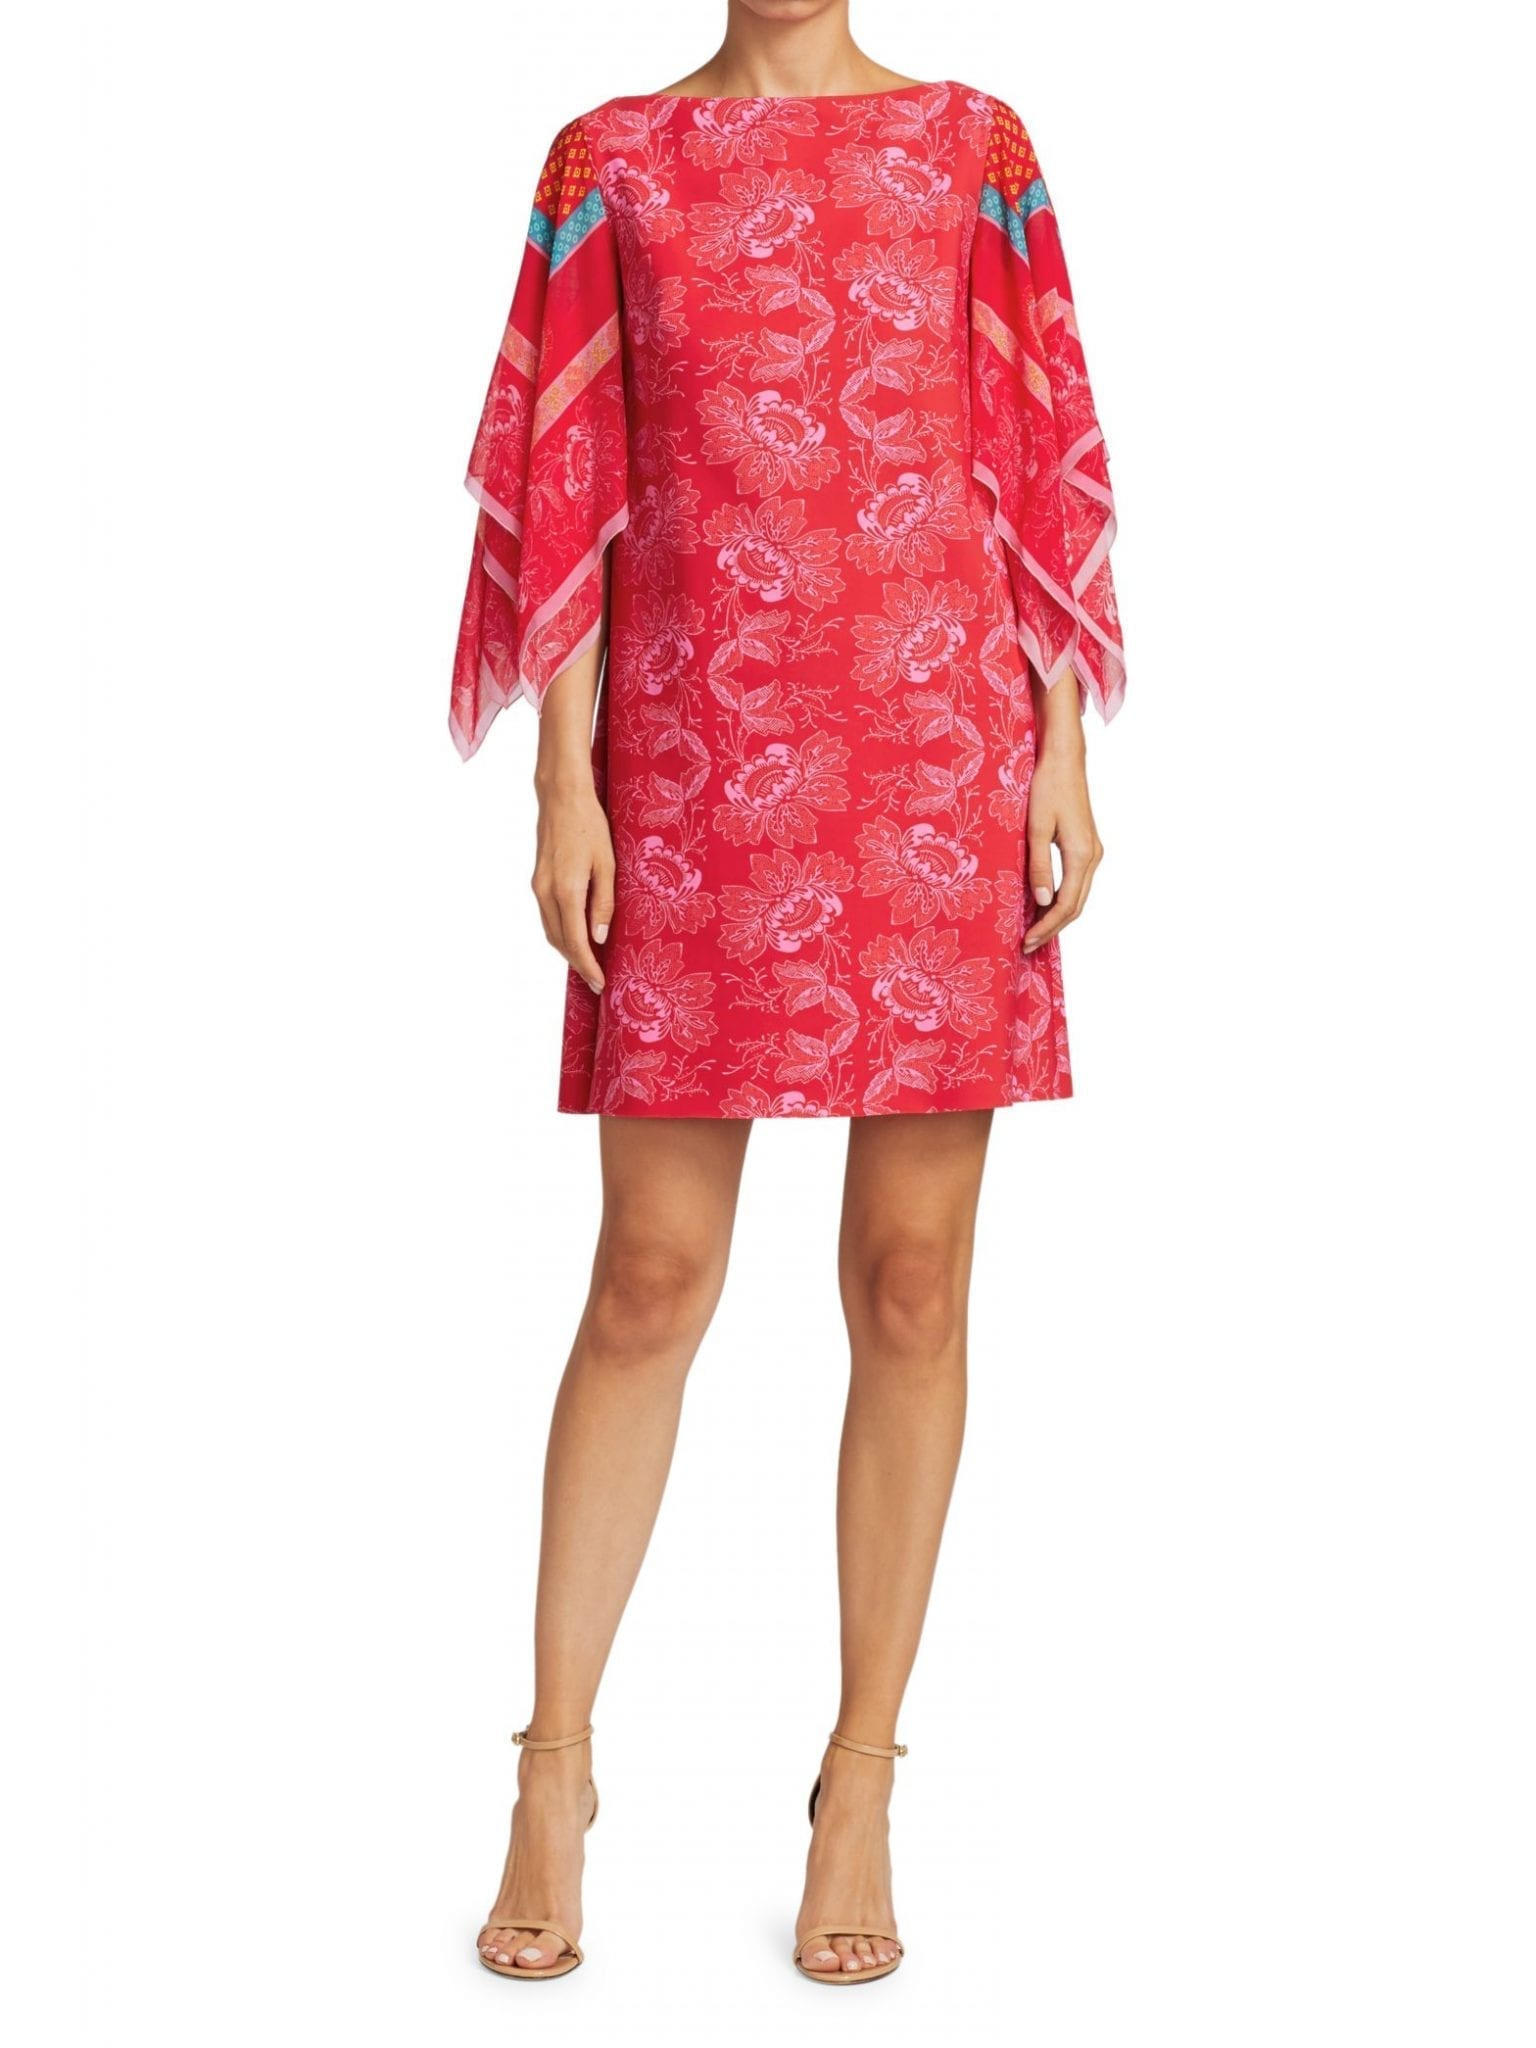 CHIARA BONI LA PETITE ROBE Karice Handkerchief-Sleeve Dress